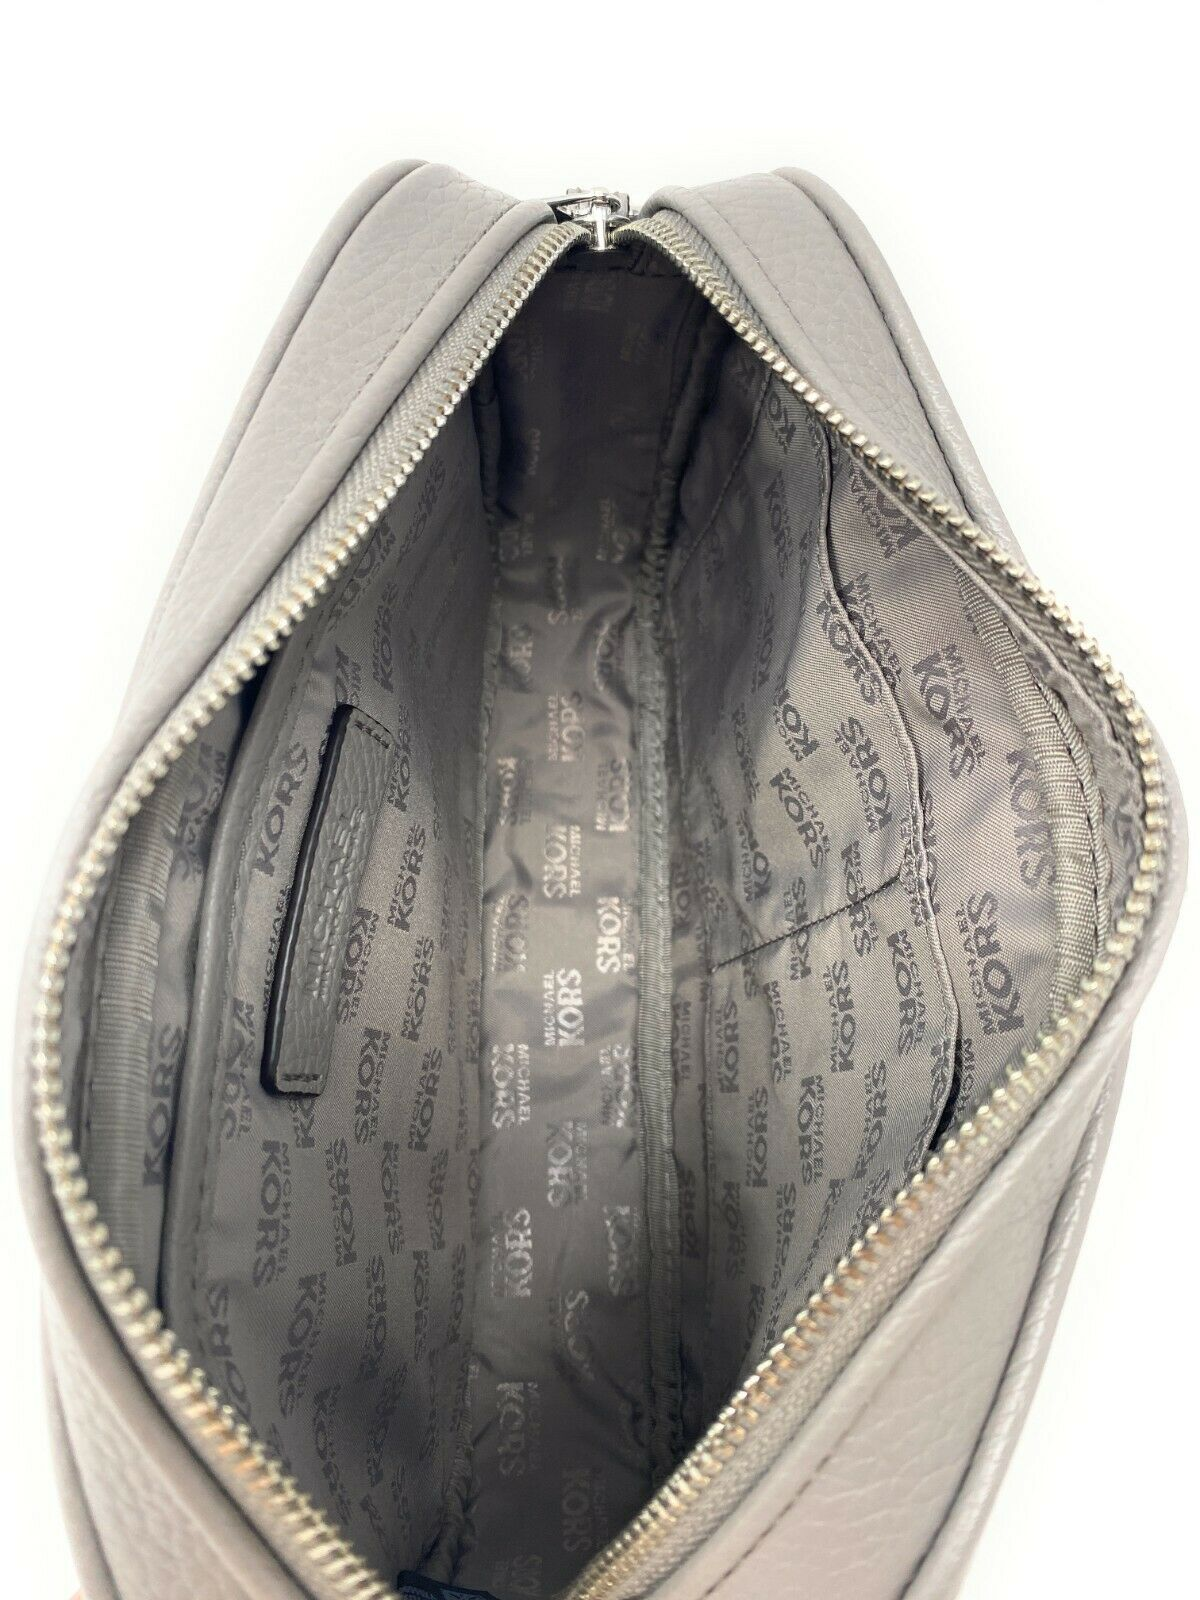 thumbnail 61 - Michael Kors Jet Set Item Large East West Crossbody Chain Handbag Clutch $298